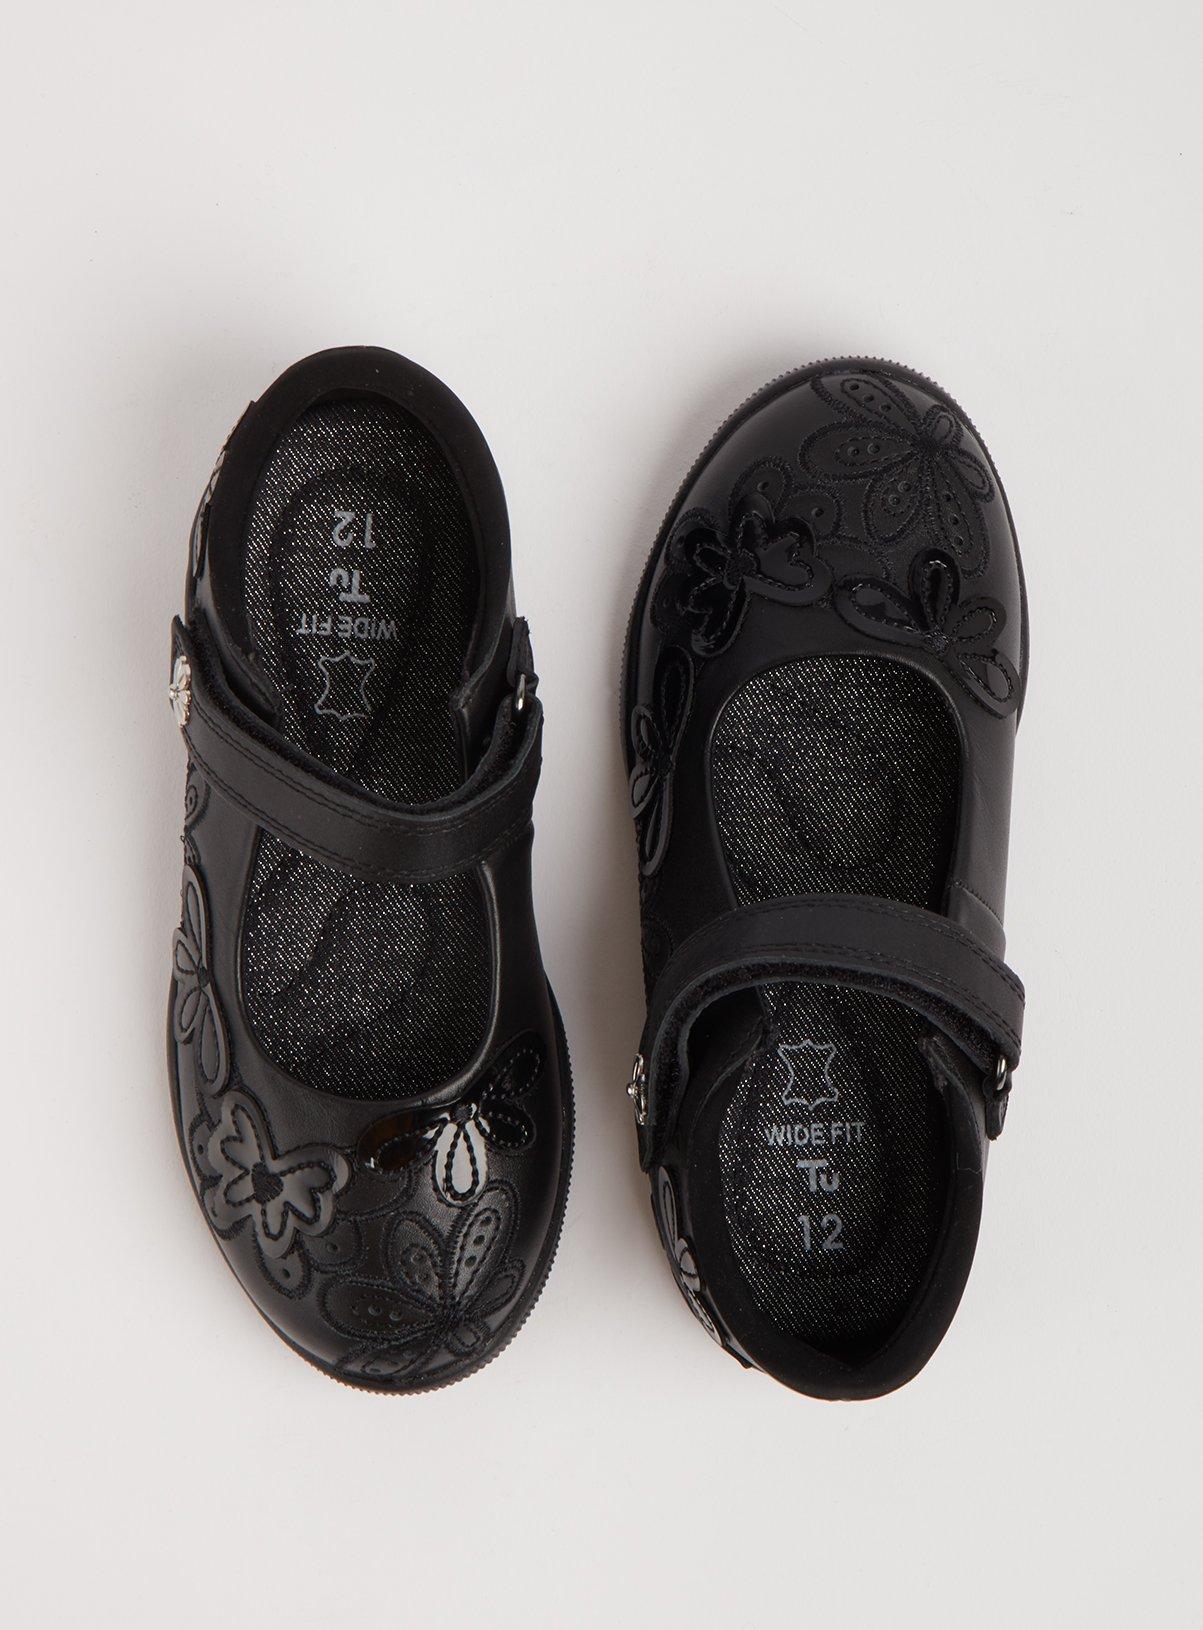 Black Leather Floral Strap Wide Fit School Shoes - 11 Infant